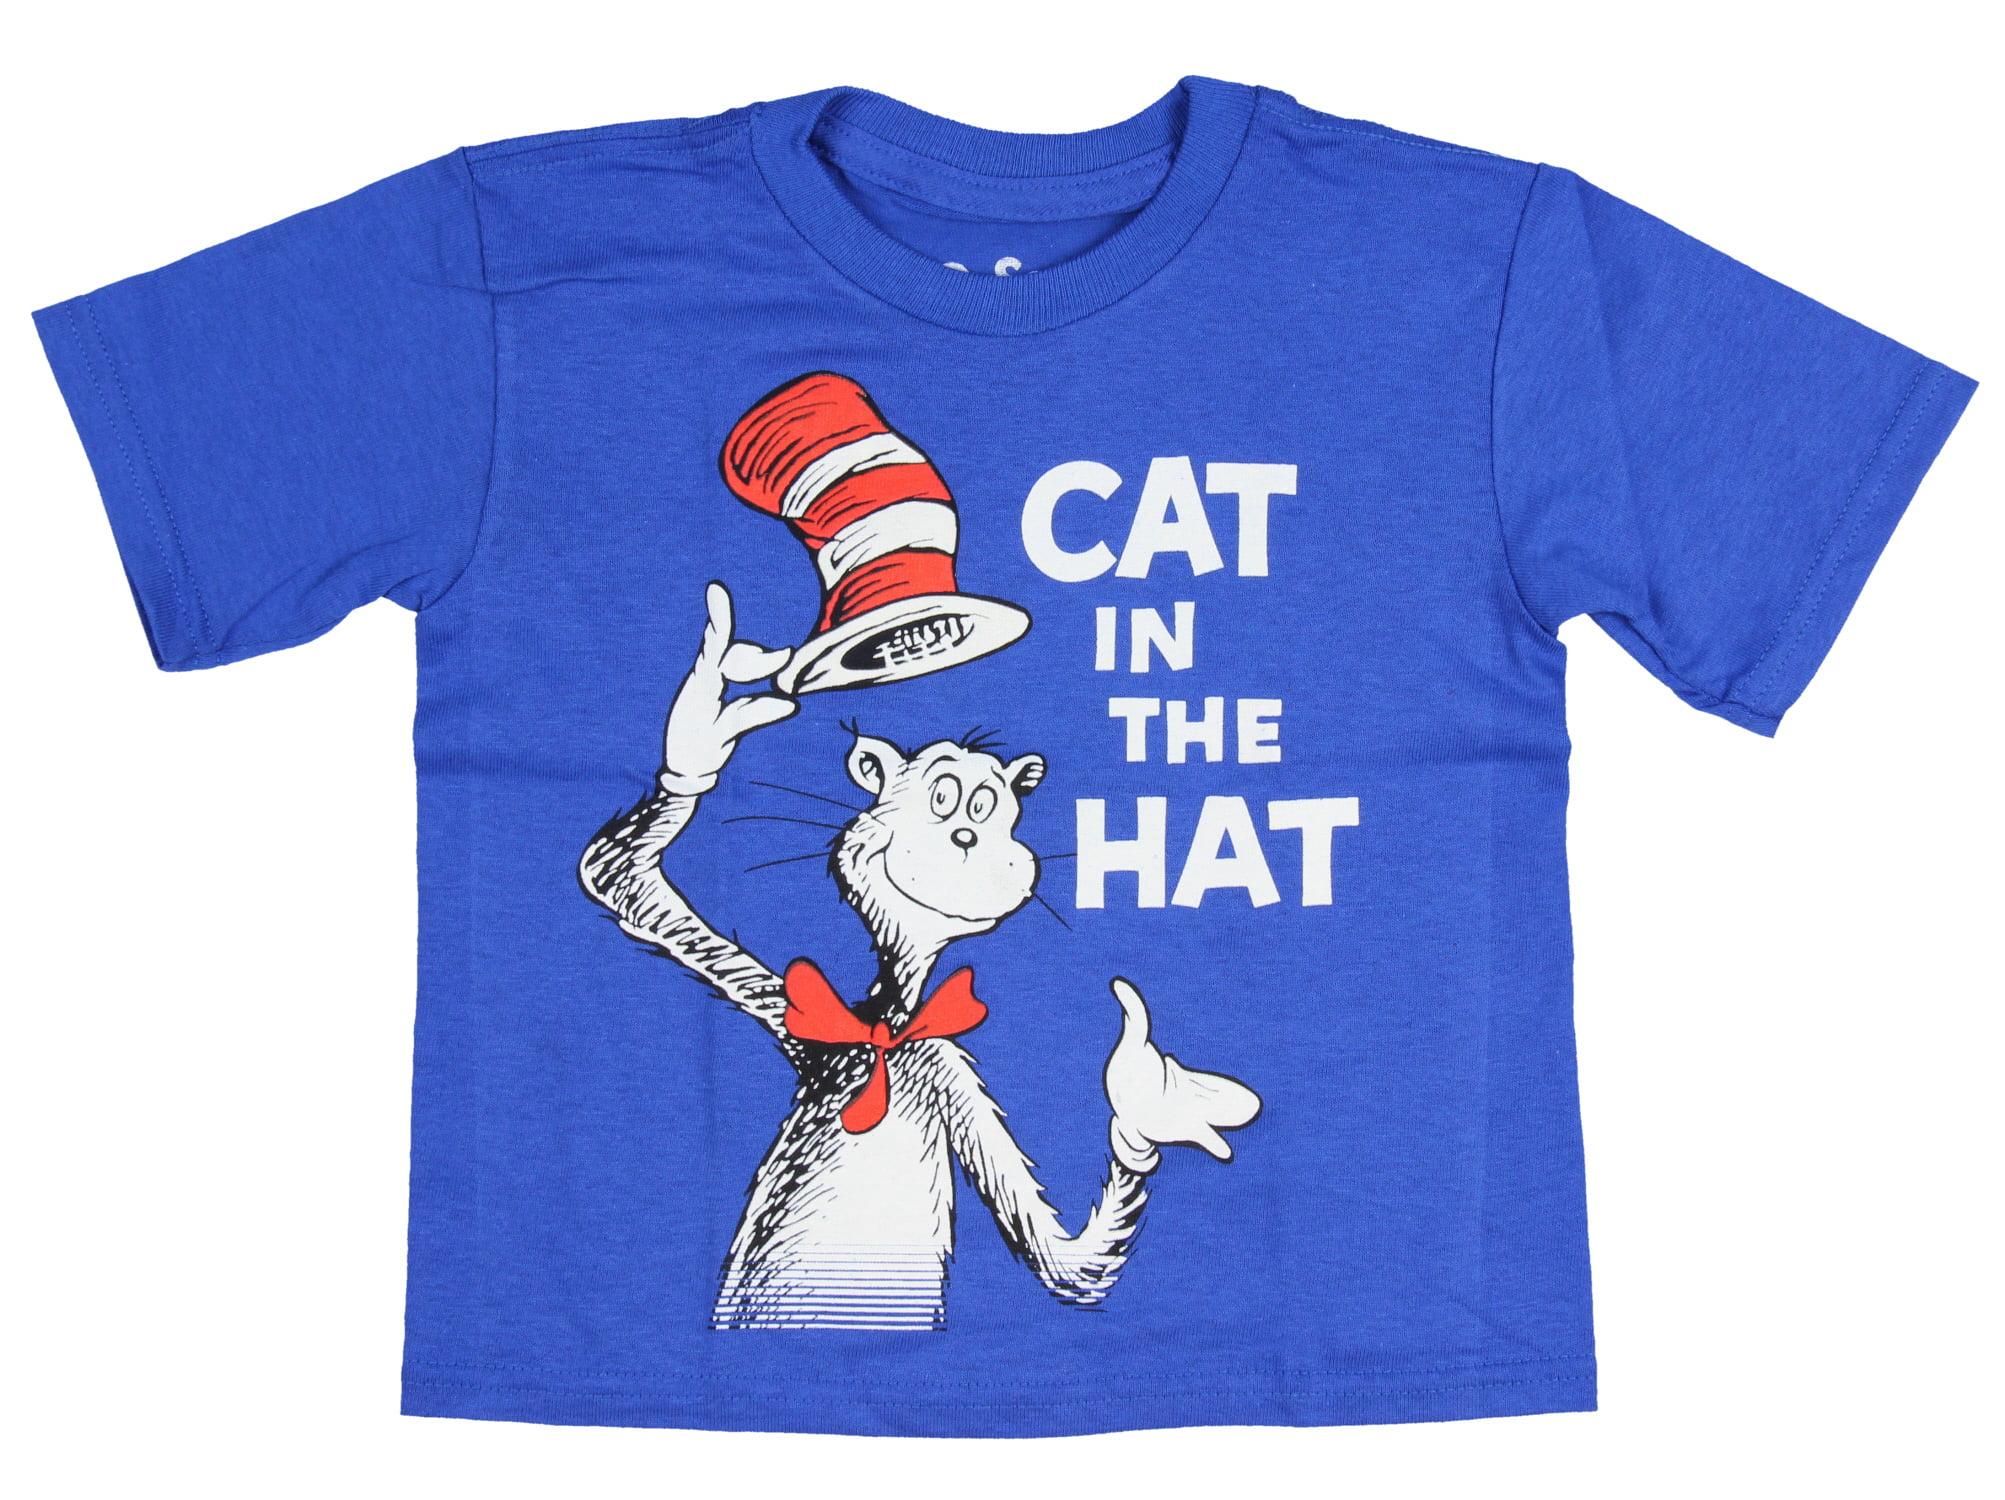 Dr Seuss Toddler 2T 3T 4T 5T Sweatshirt Shirt Cat in the Hat Boy or Girl